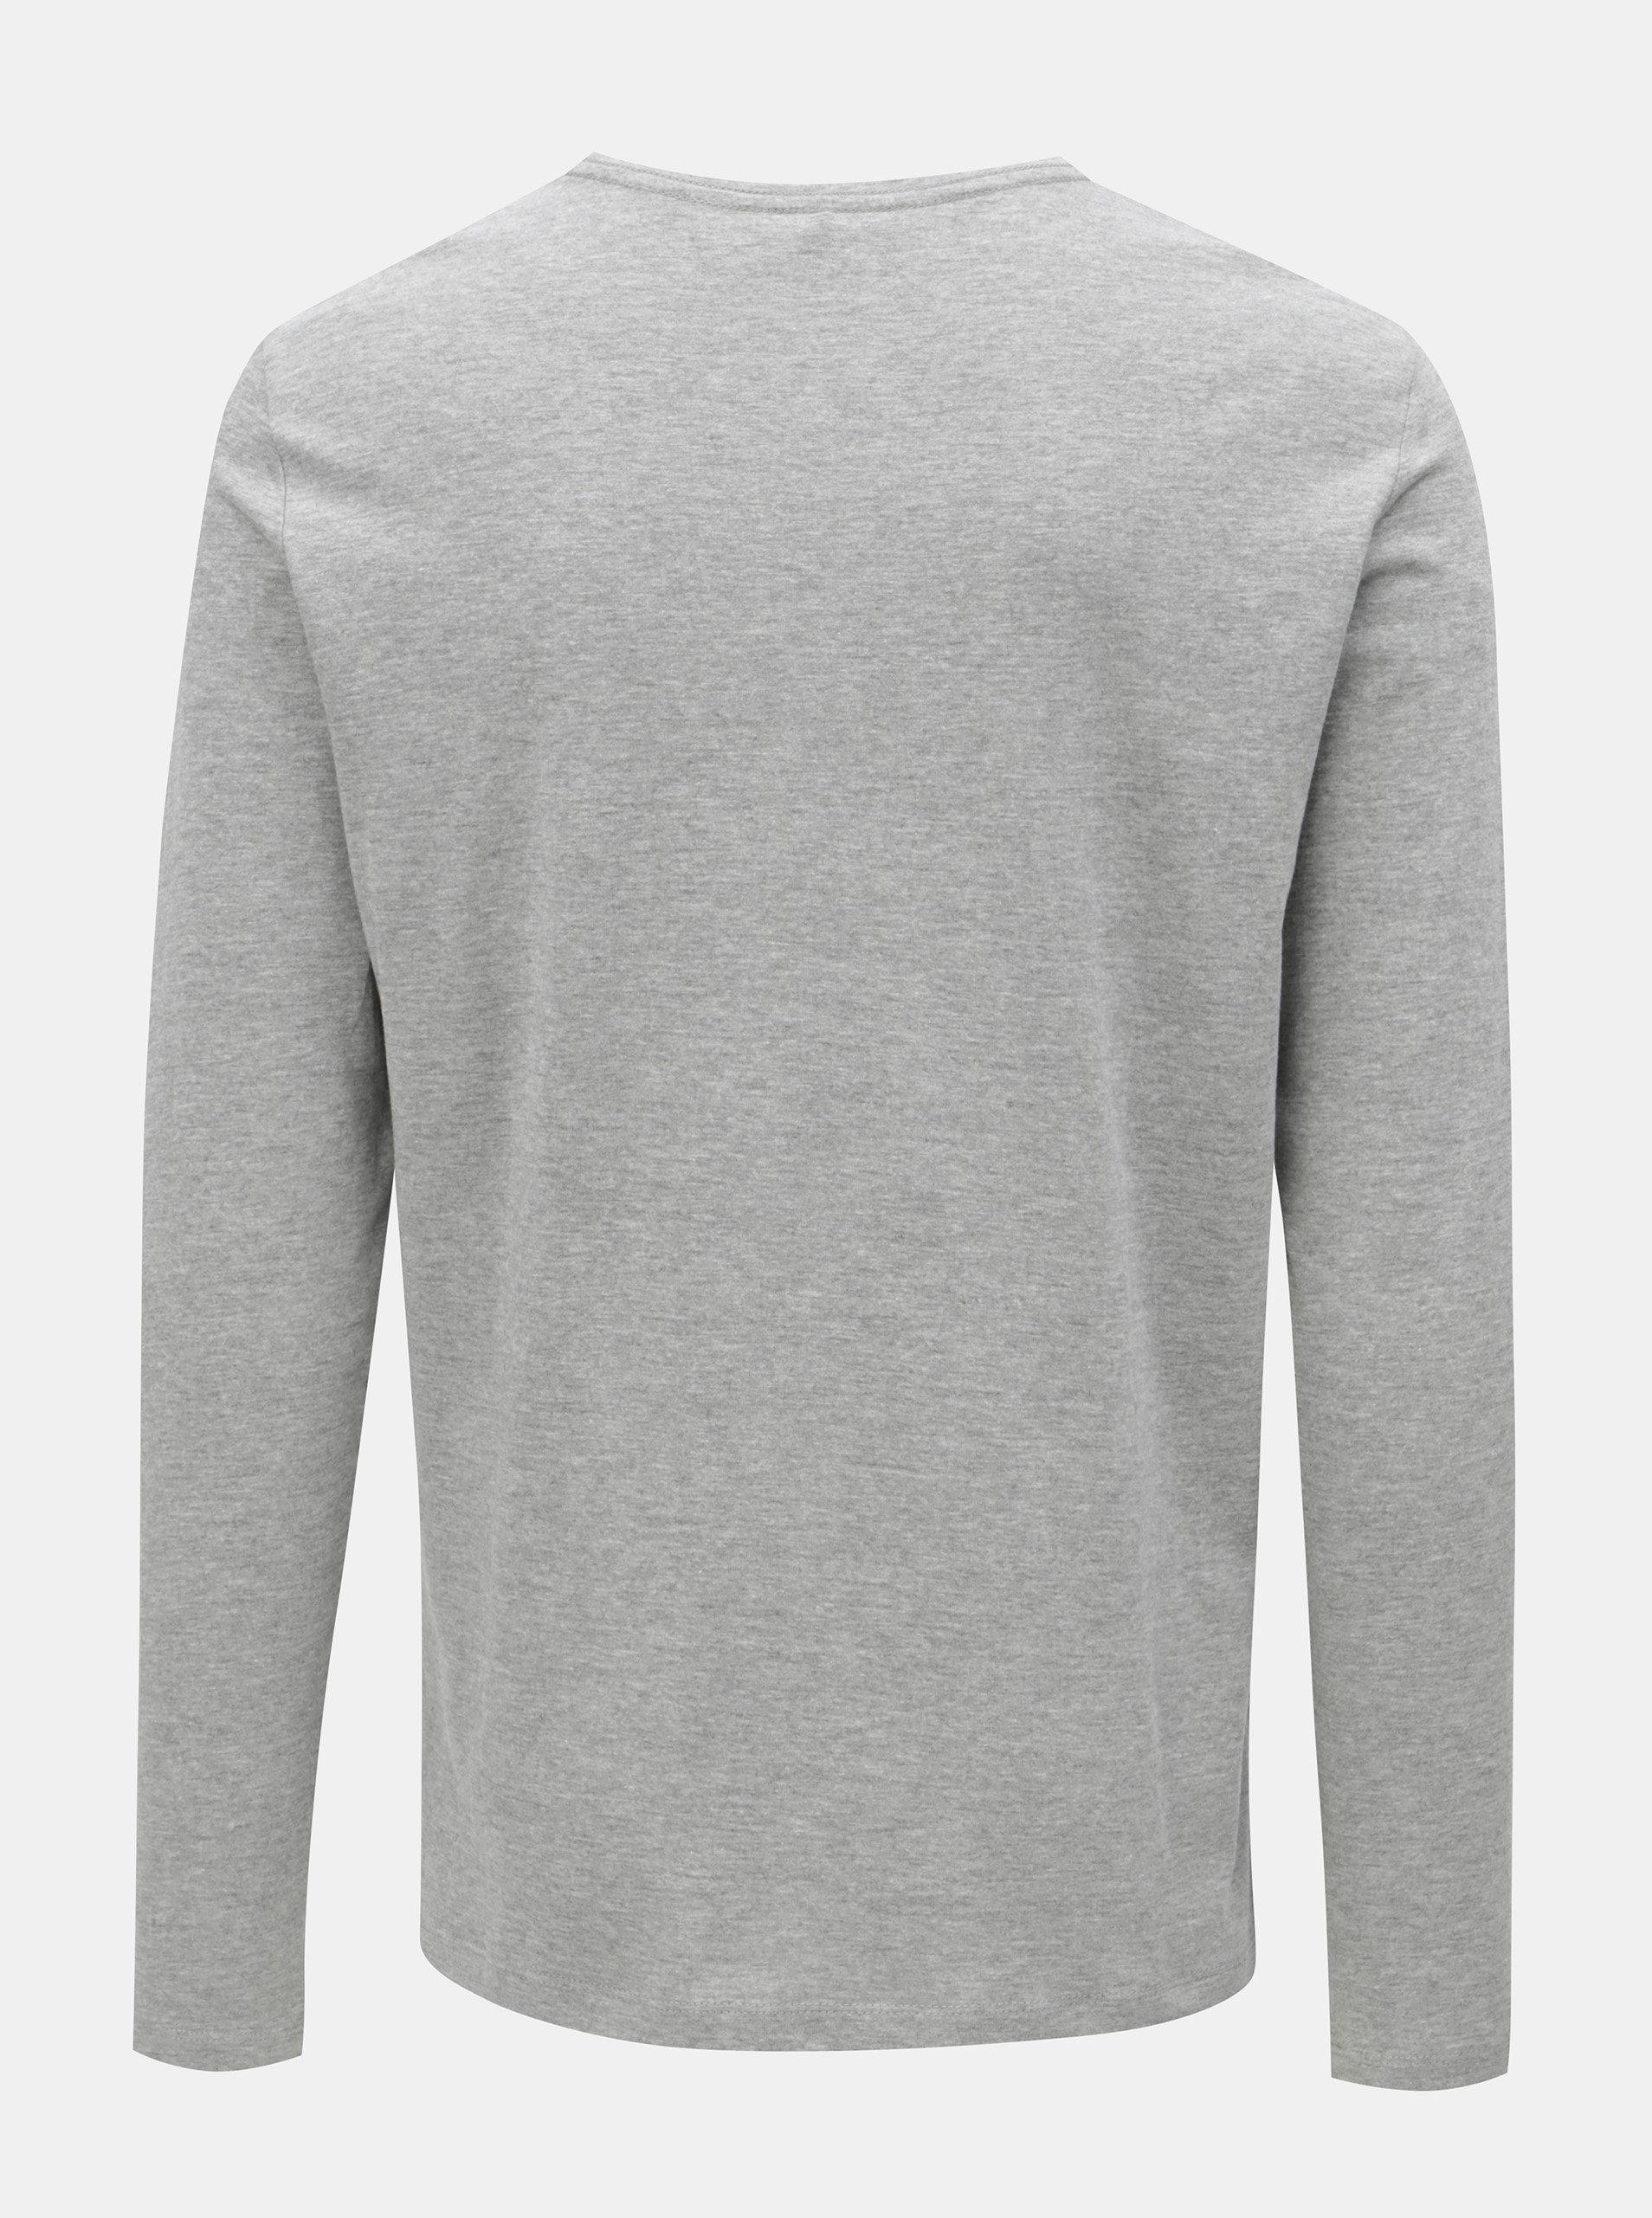 a1593f82d631 Sivé regular tričko s dlhým rukávom Blend ...